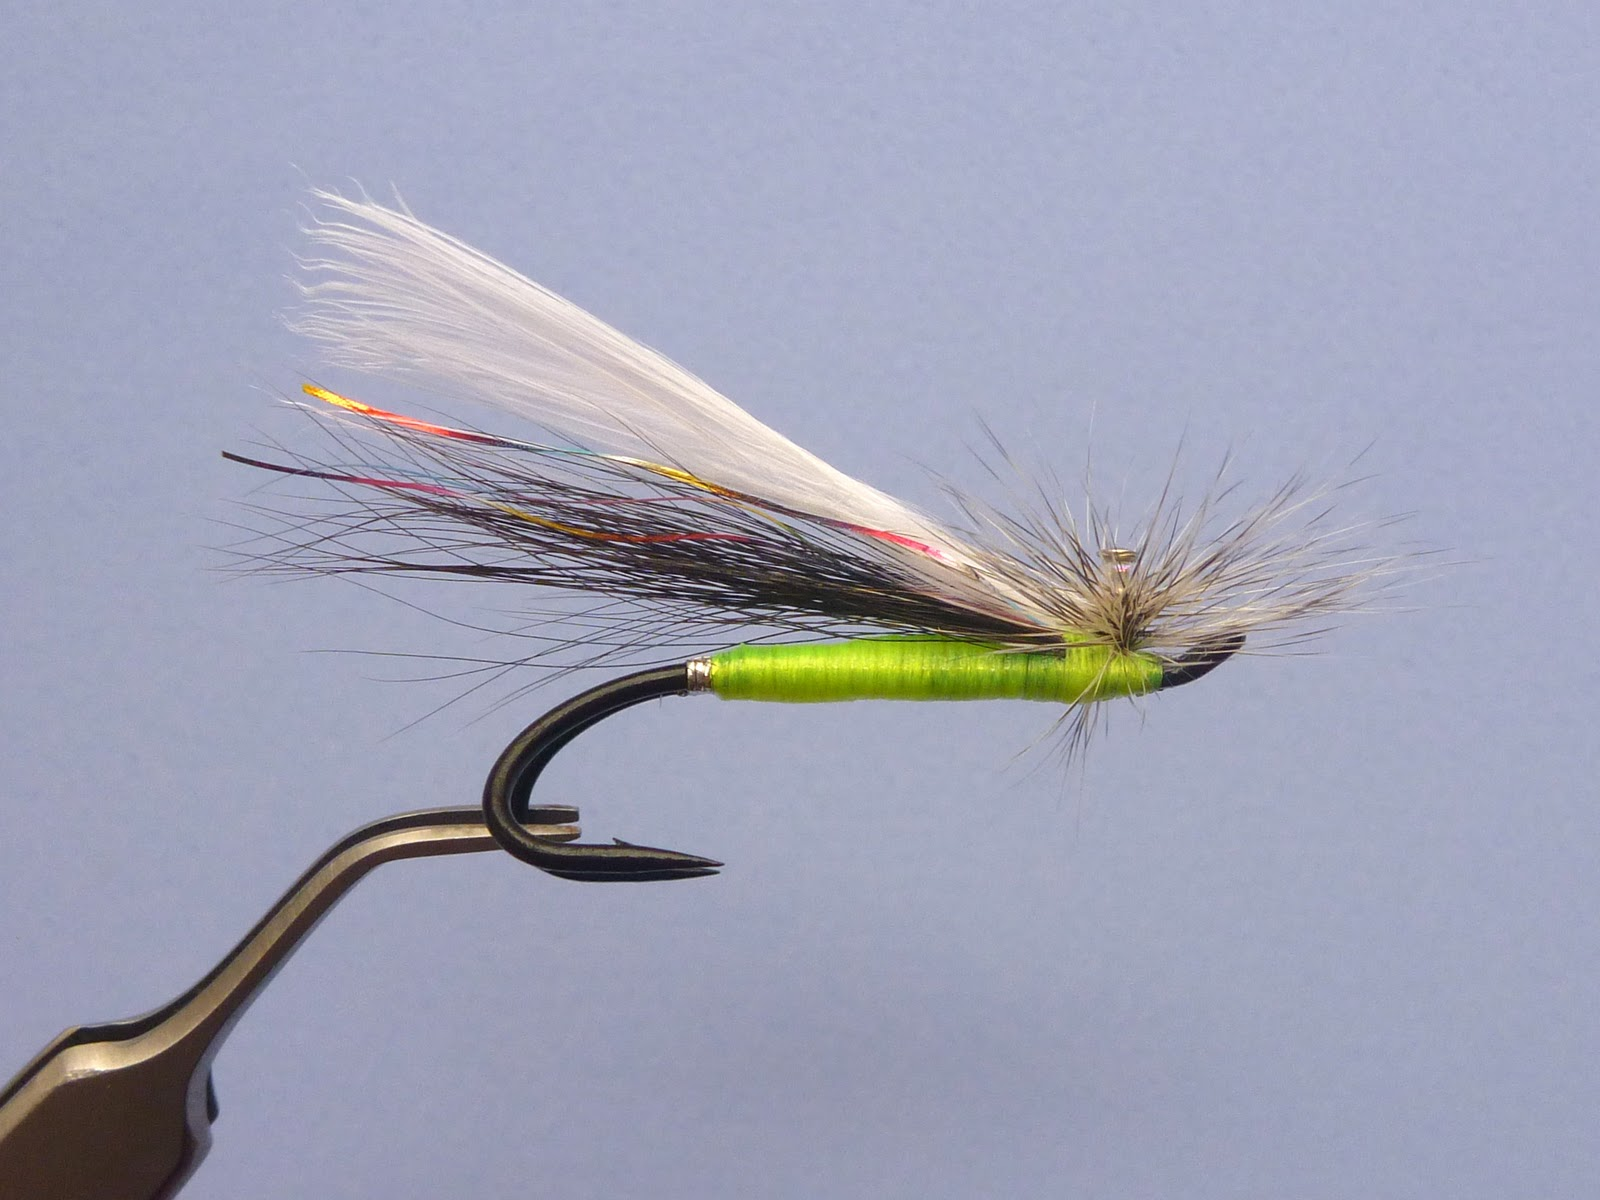 Atlantic Salmon Flies: Ghost Stone Fly #2 Double Atlantic Salmon Flies Patterns